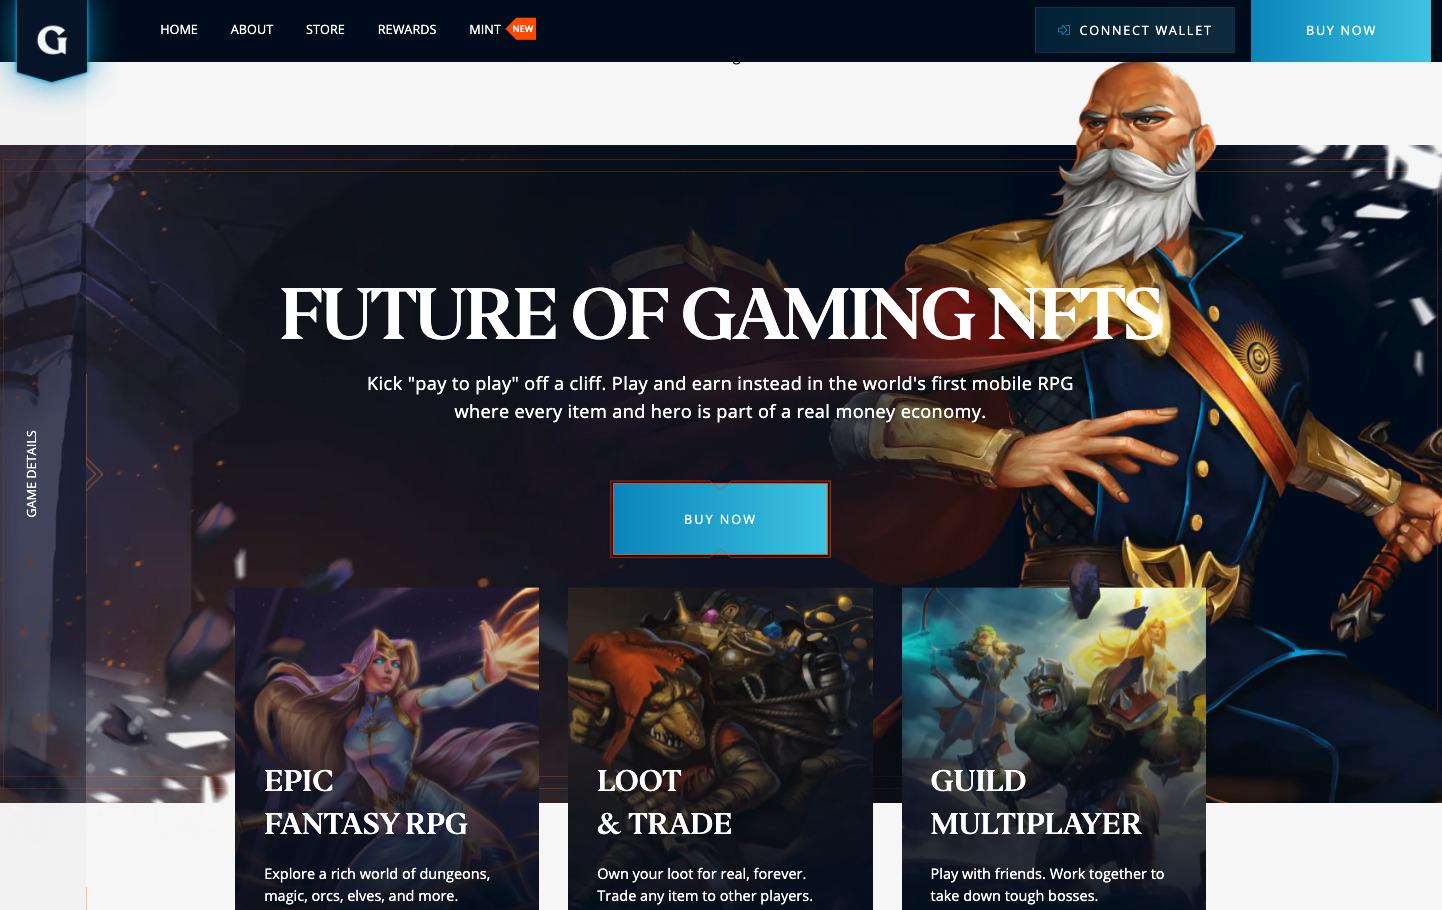 Best upcoming NFT games - Guild of Guardians Roadmap